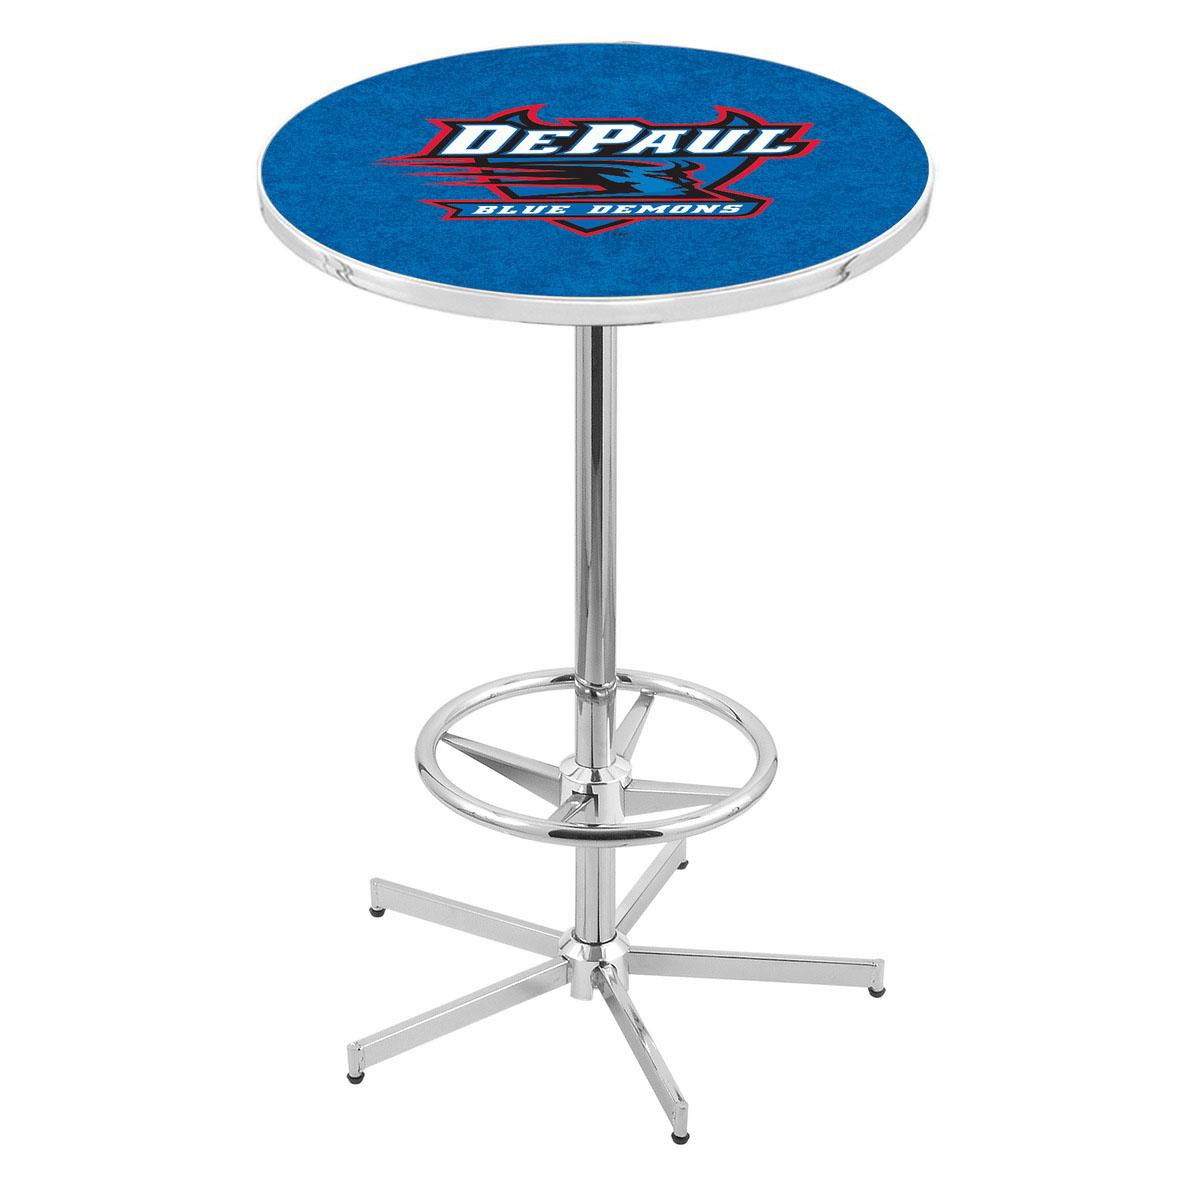 Design Chrome Depaul Pub Table Product Photo